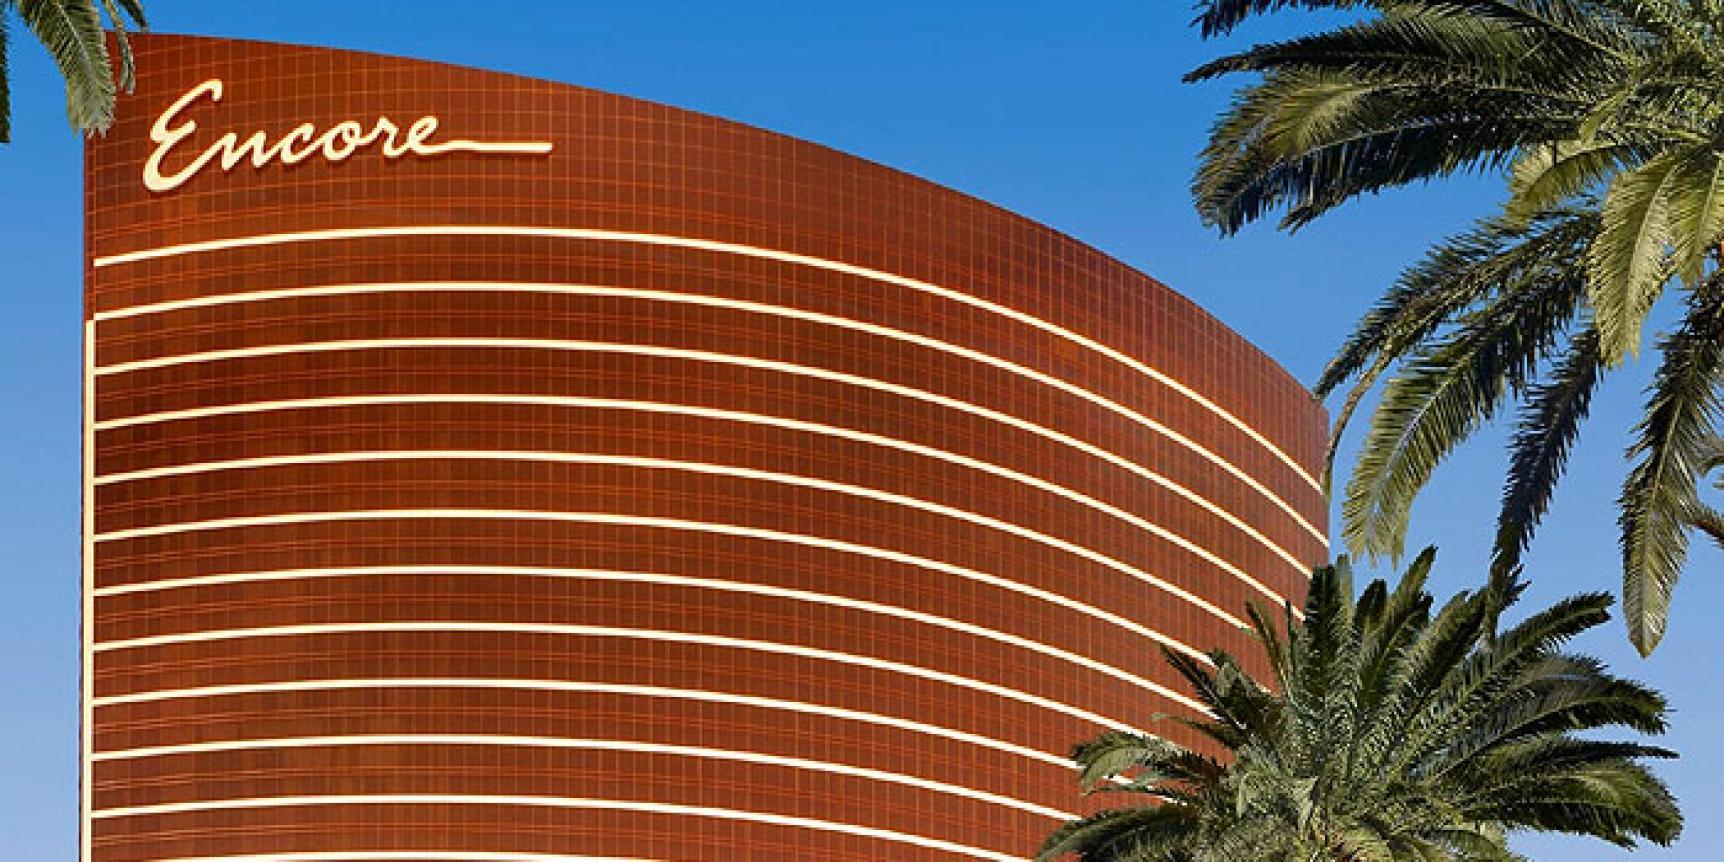 Encore Las Vegas - © fabulous-vegas.de